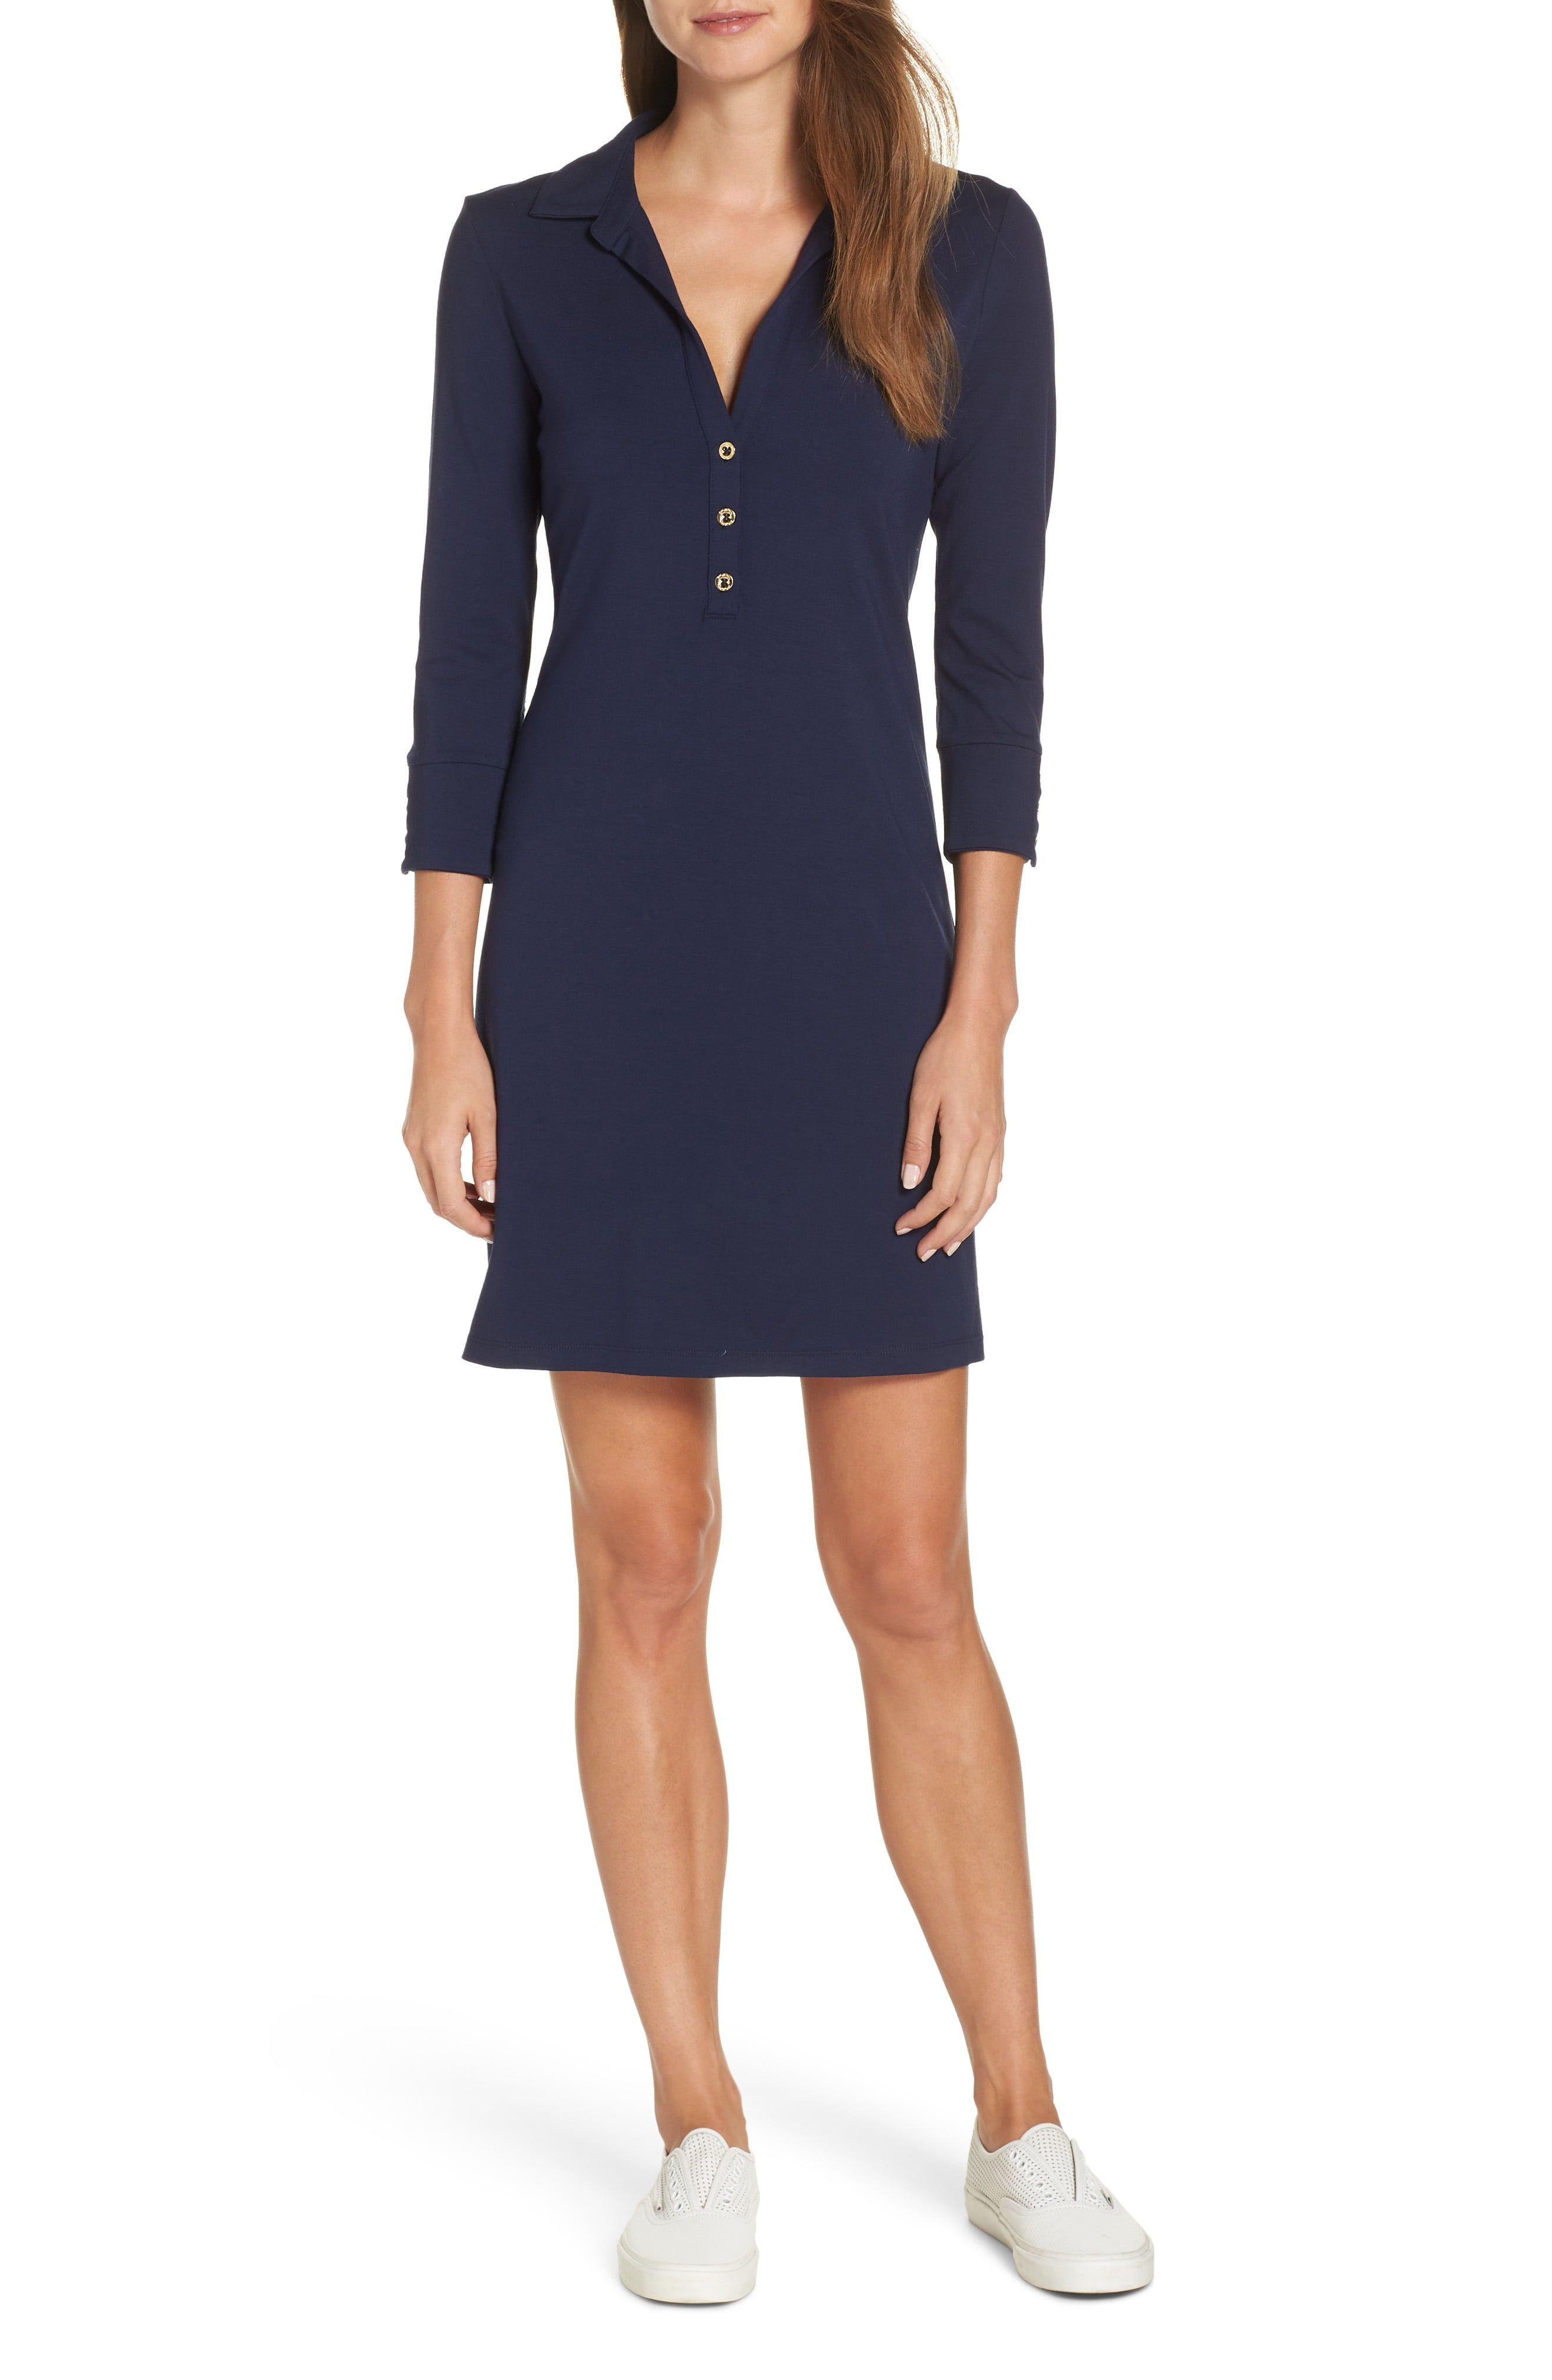 Lilly pulitzer ansley upf 50 polo shift dress fashion